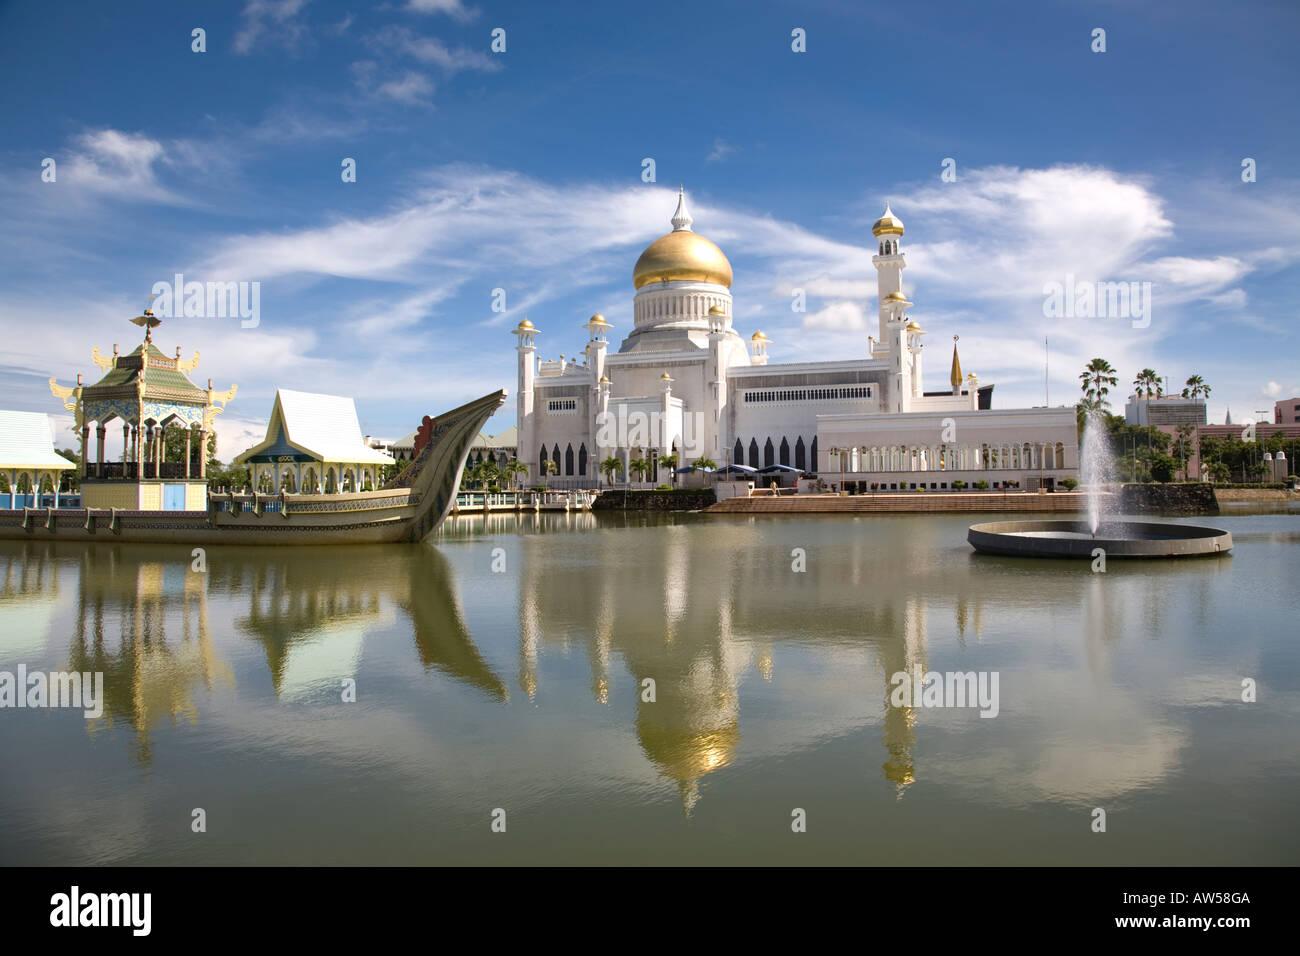 Omar Ali Saifuddien Mosque, Bandar Seri Begawan, Brunei - Stock Image